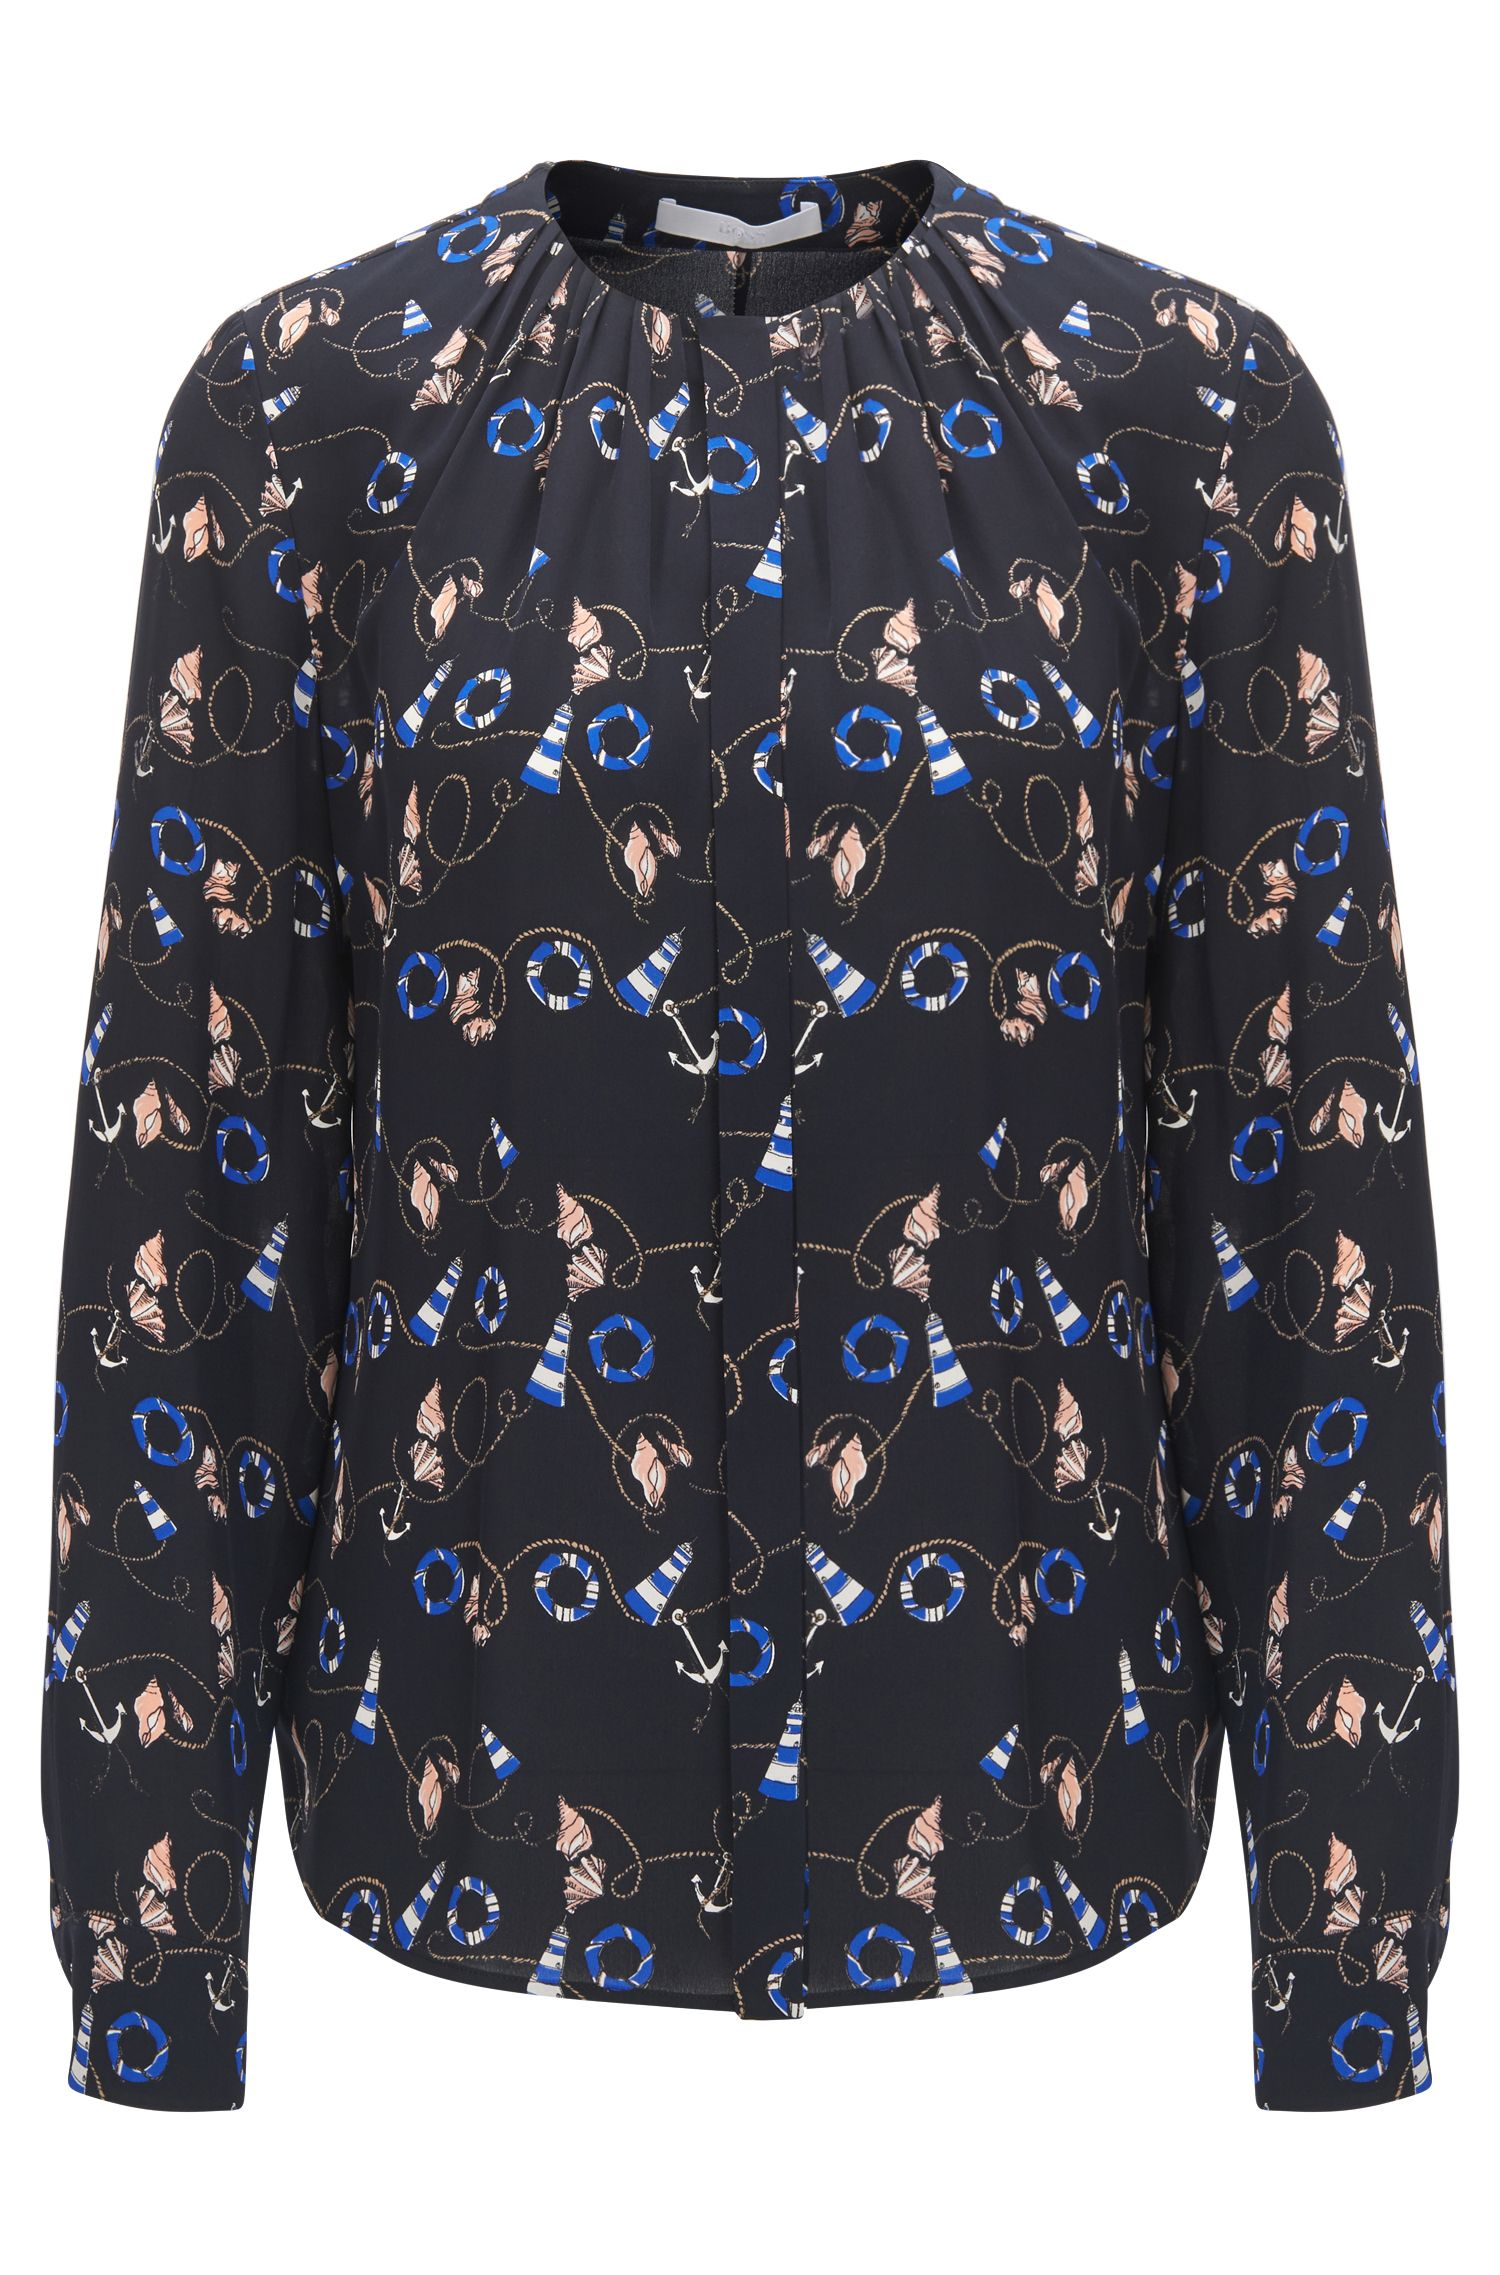 Silk nautical-print blouse with gathered neckline